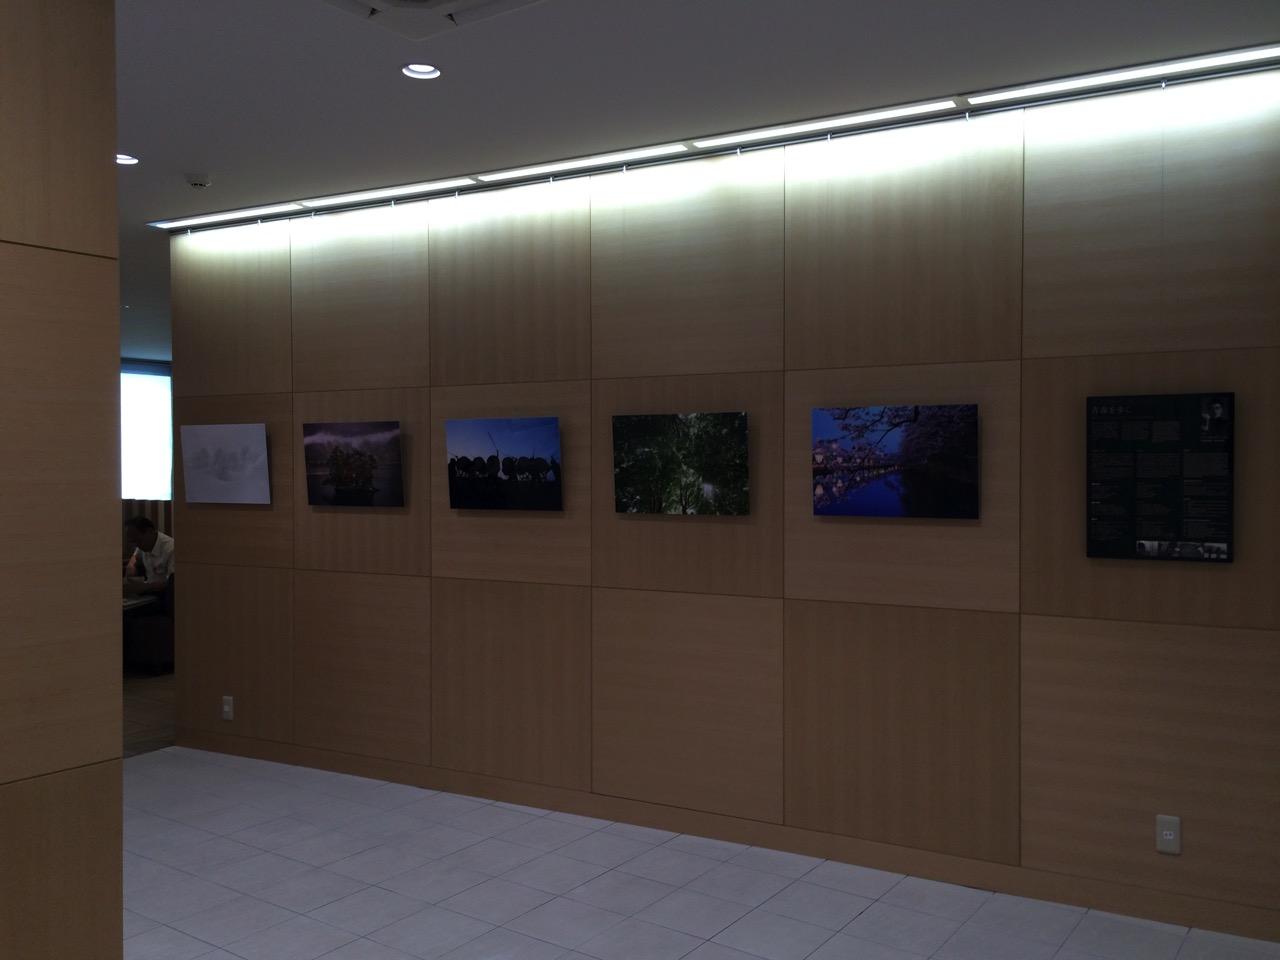 青森空港ラウンジ